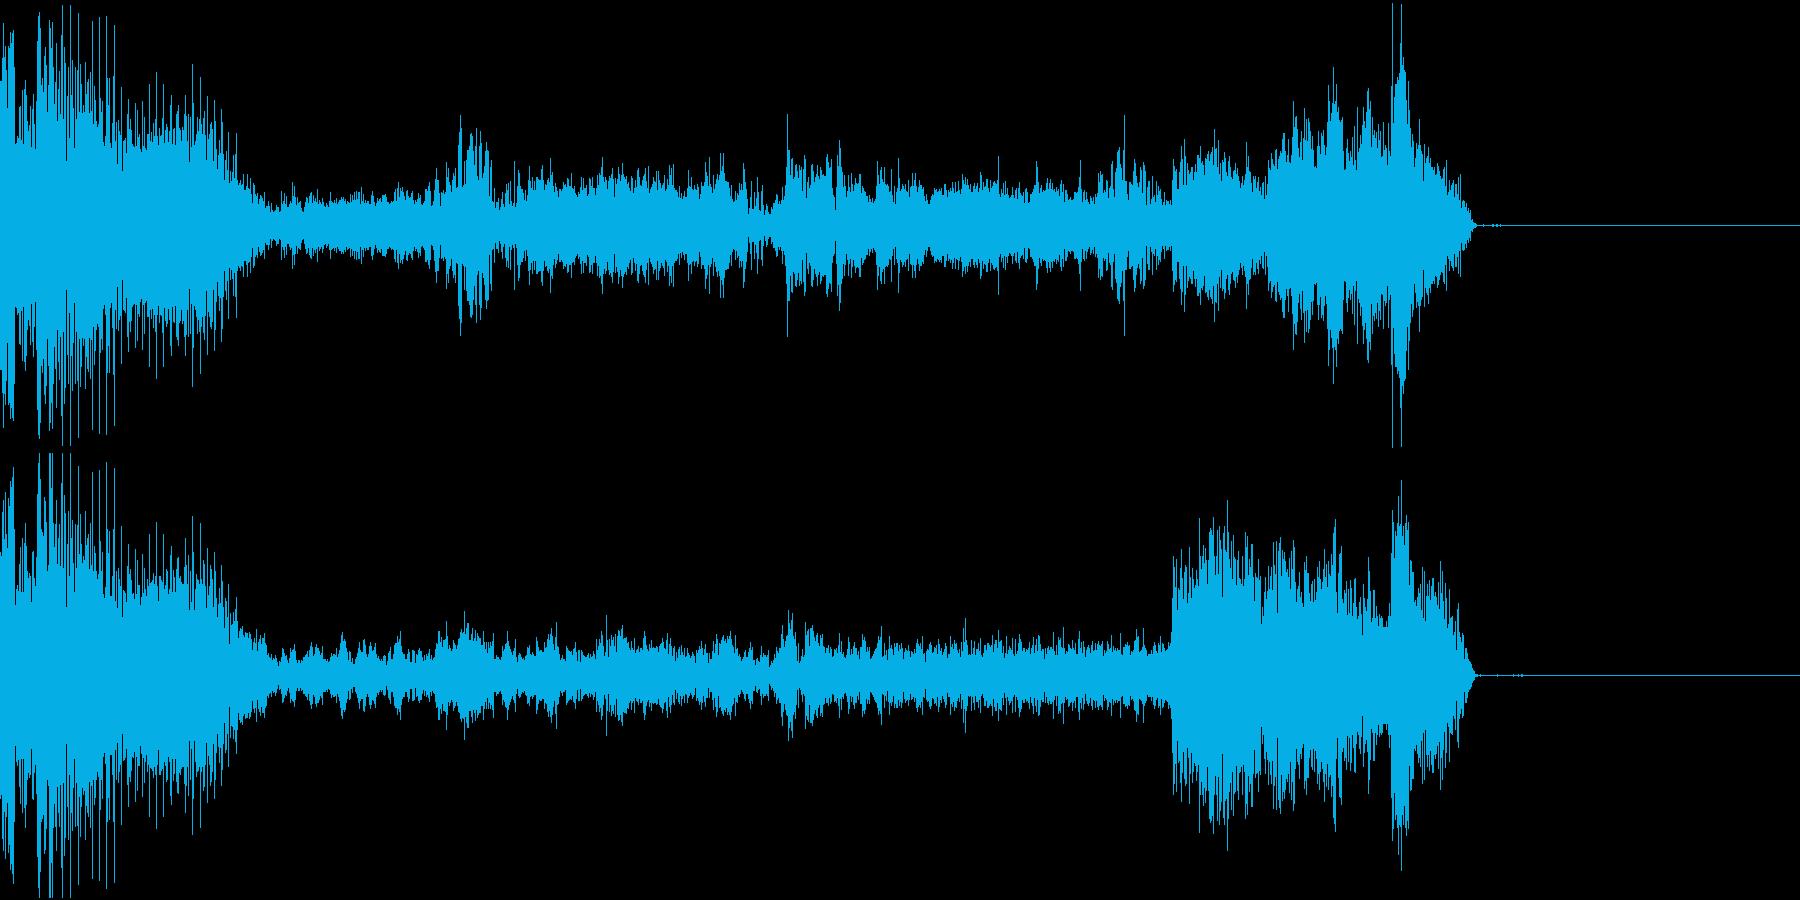 FMラジオ的ジングル8の再生済みの波形